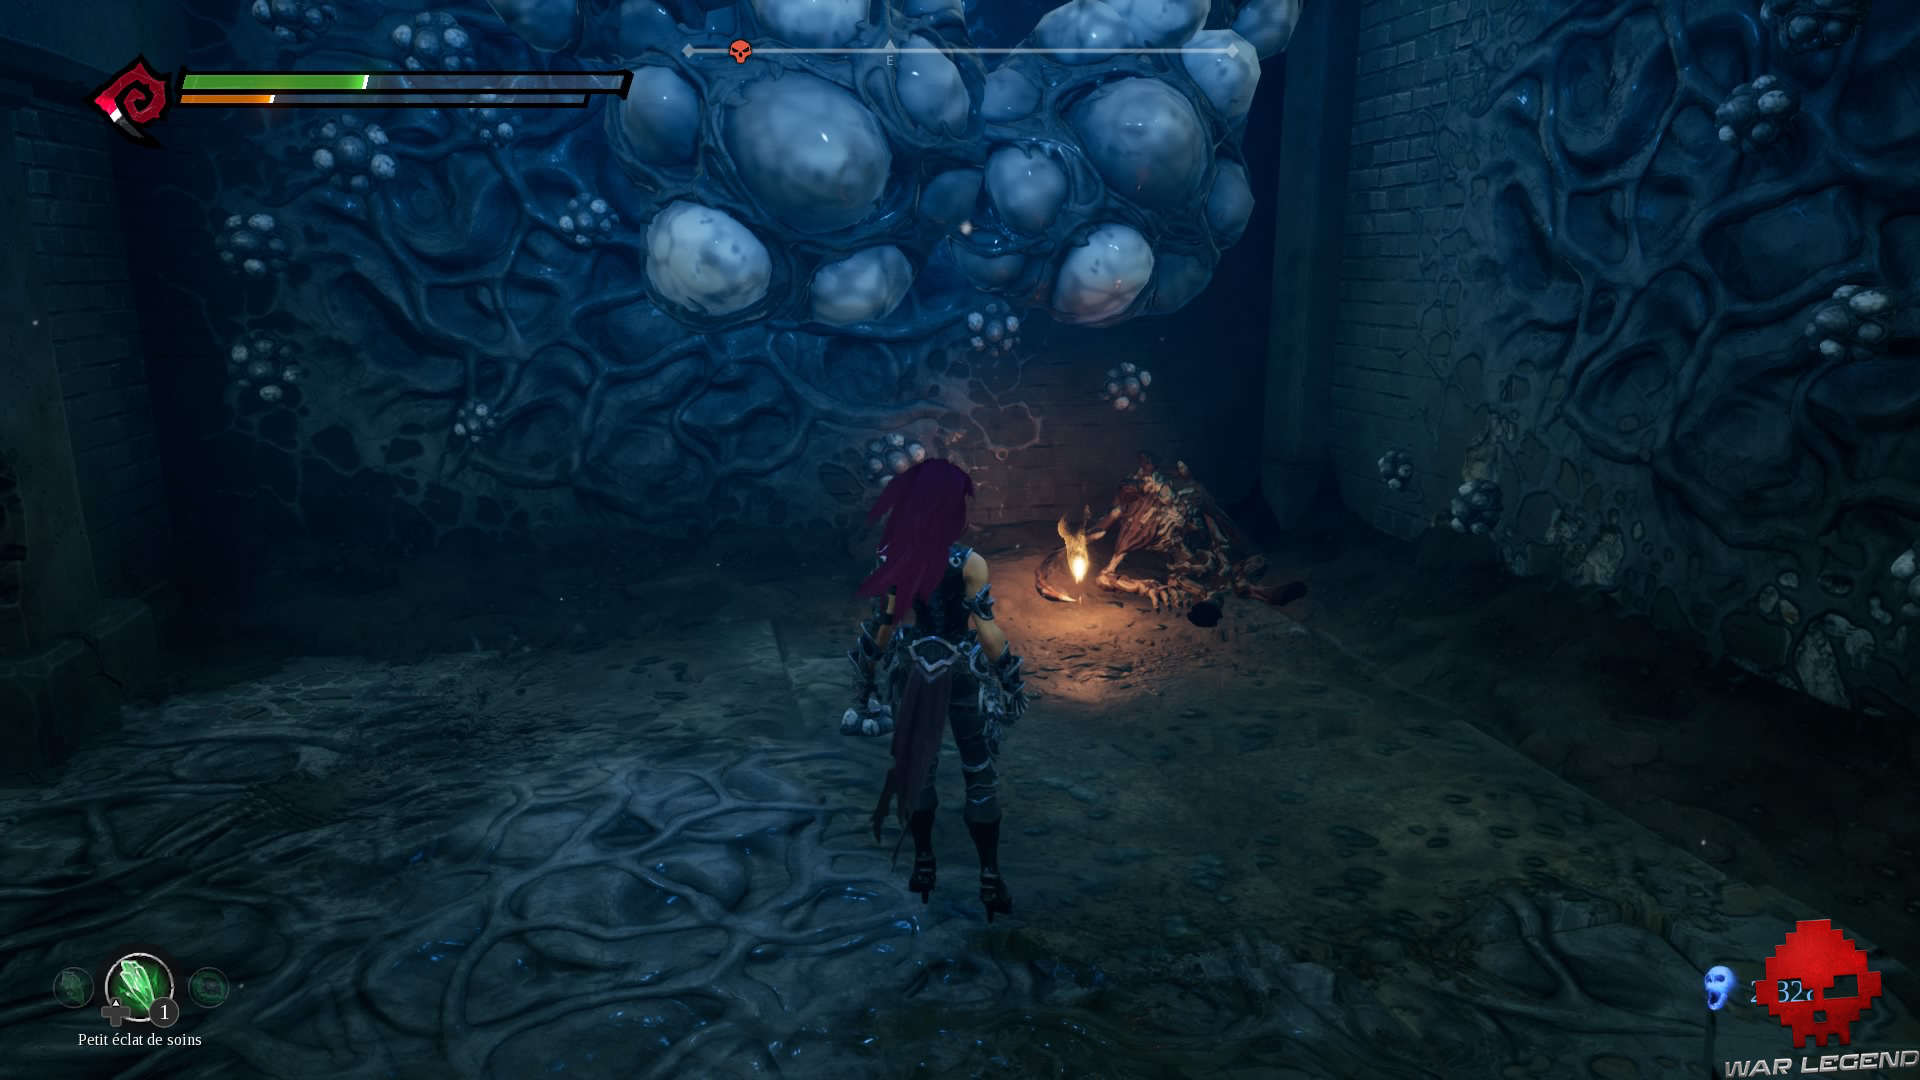 Darksiders III objet au sol